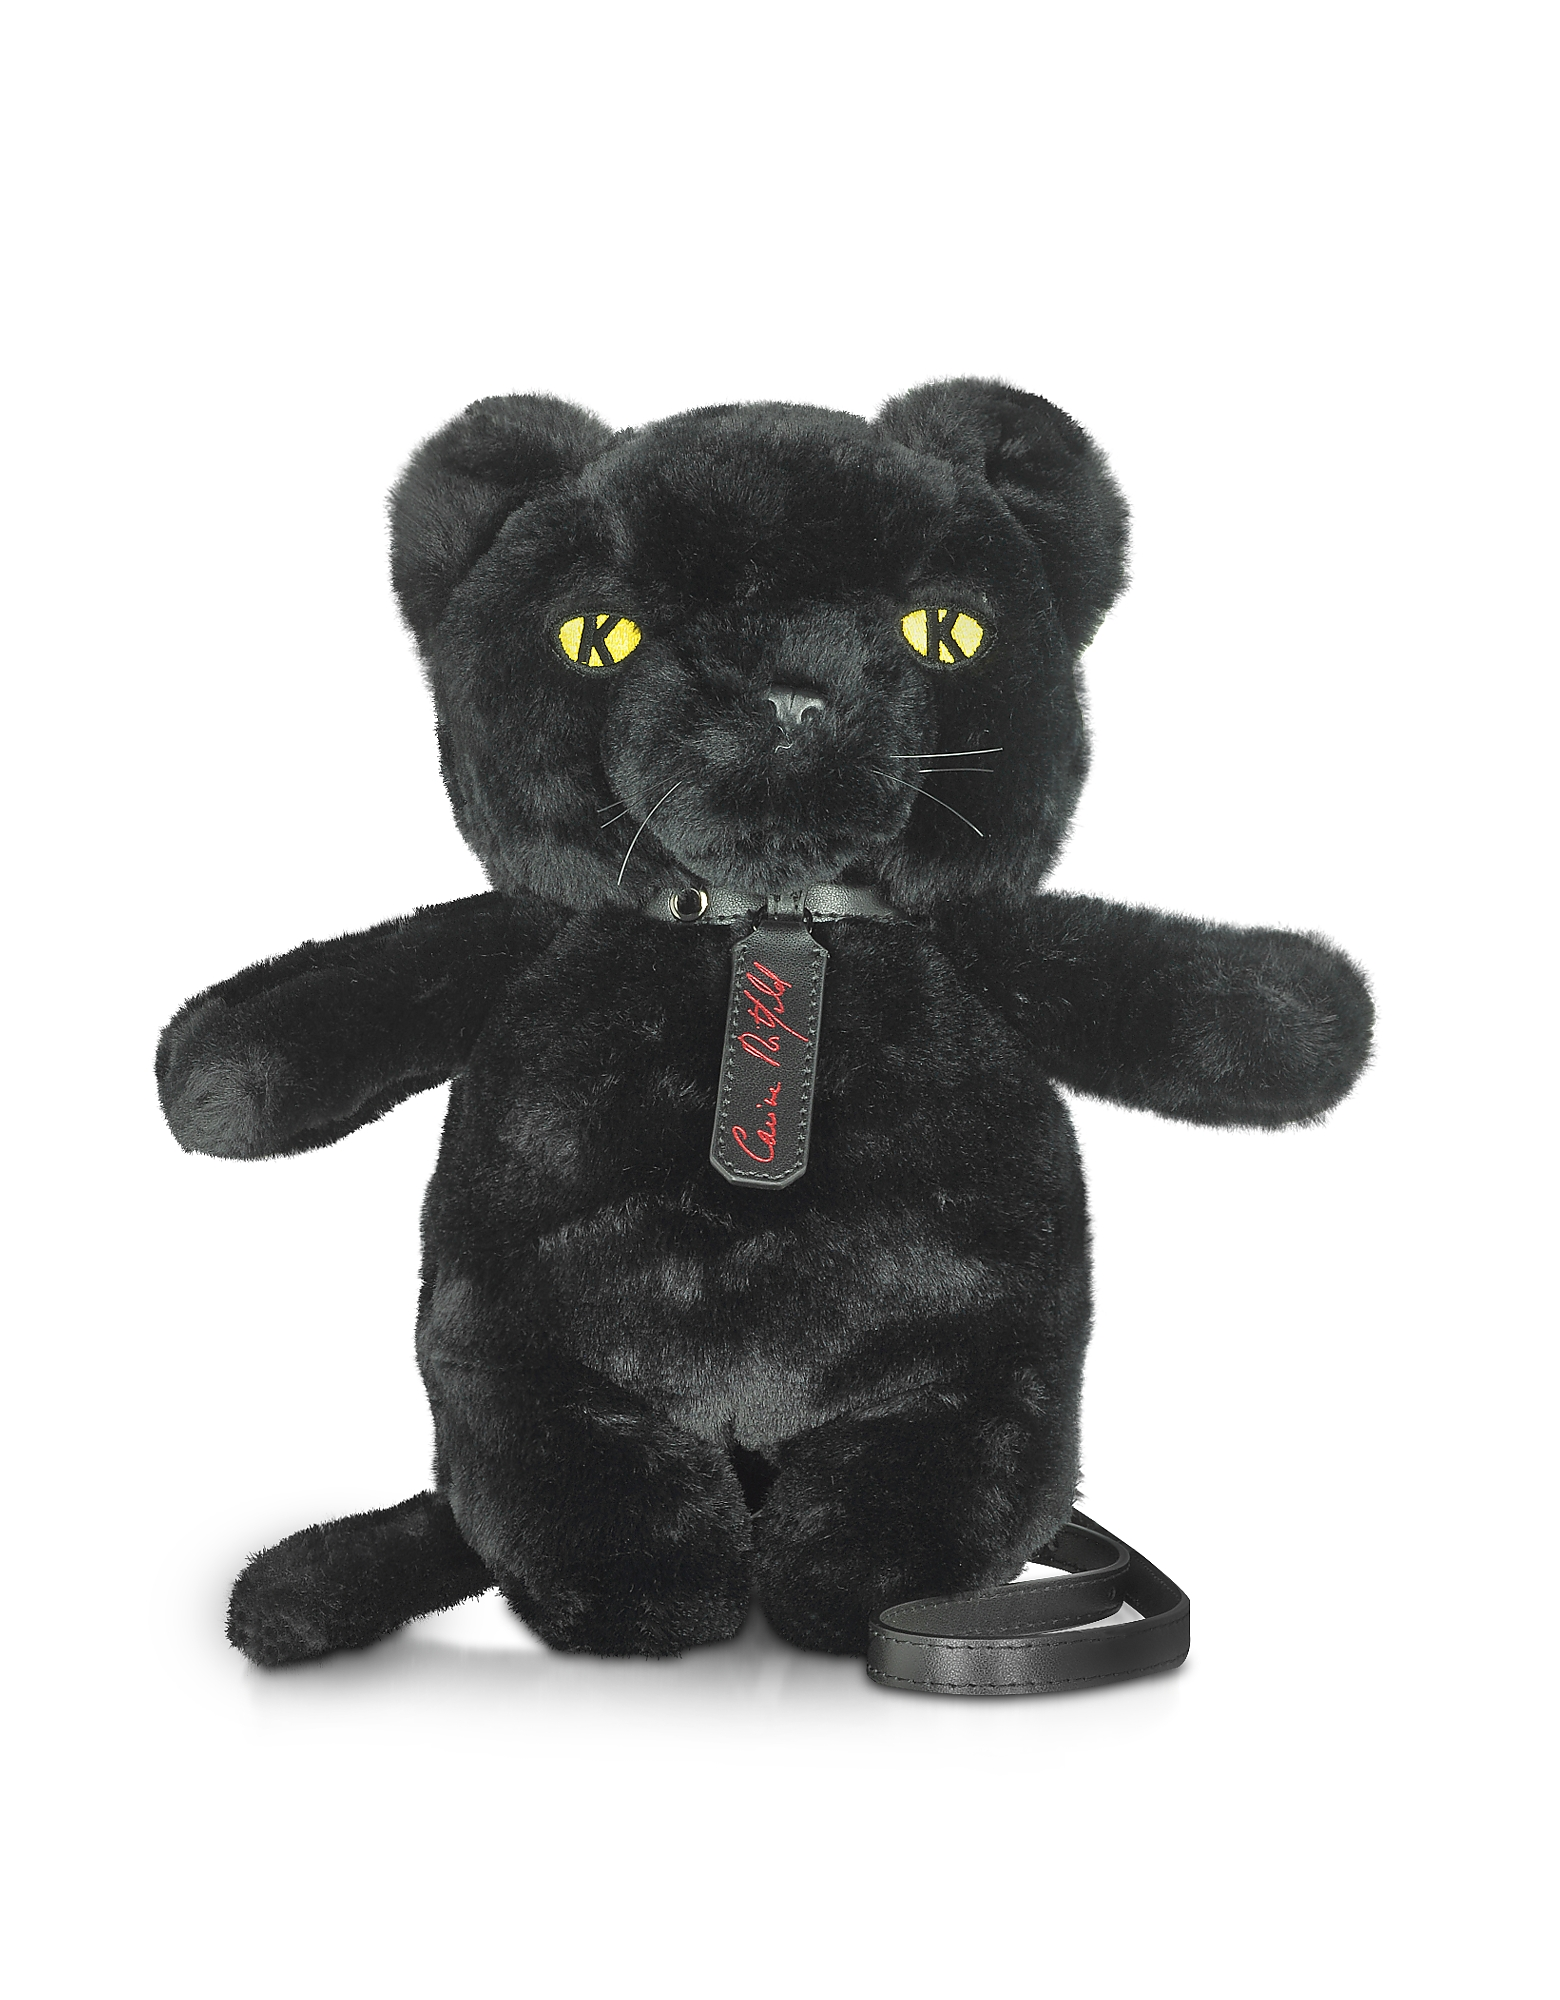 Carine X Karl Black Panther Crossbody Bag